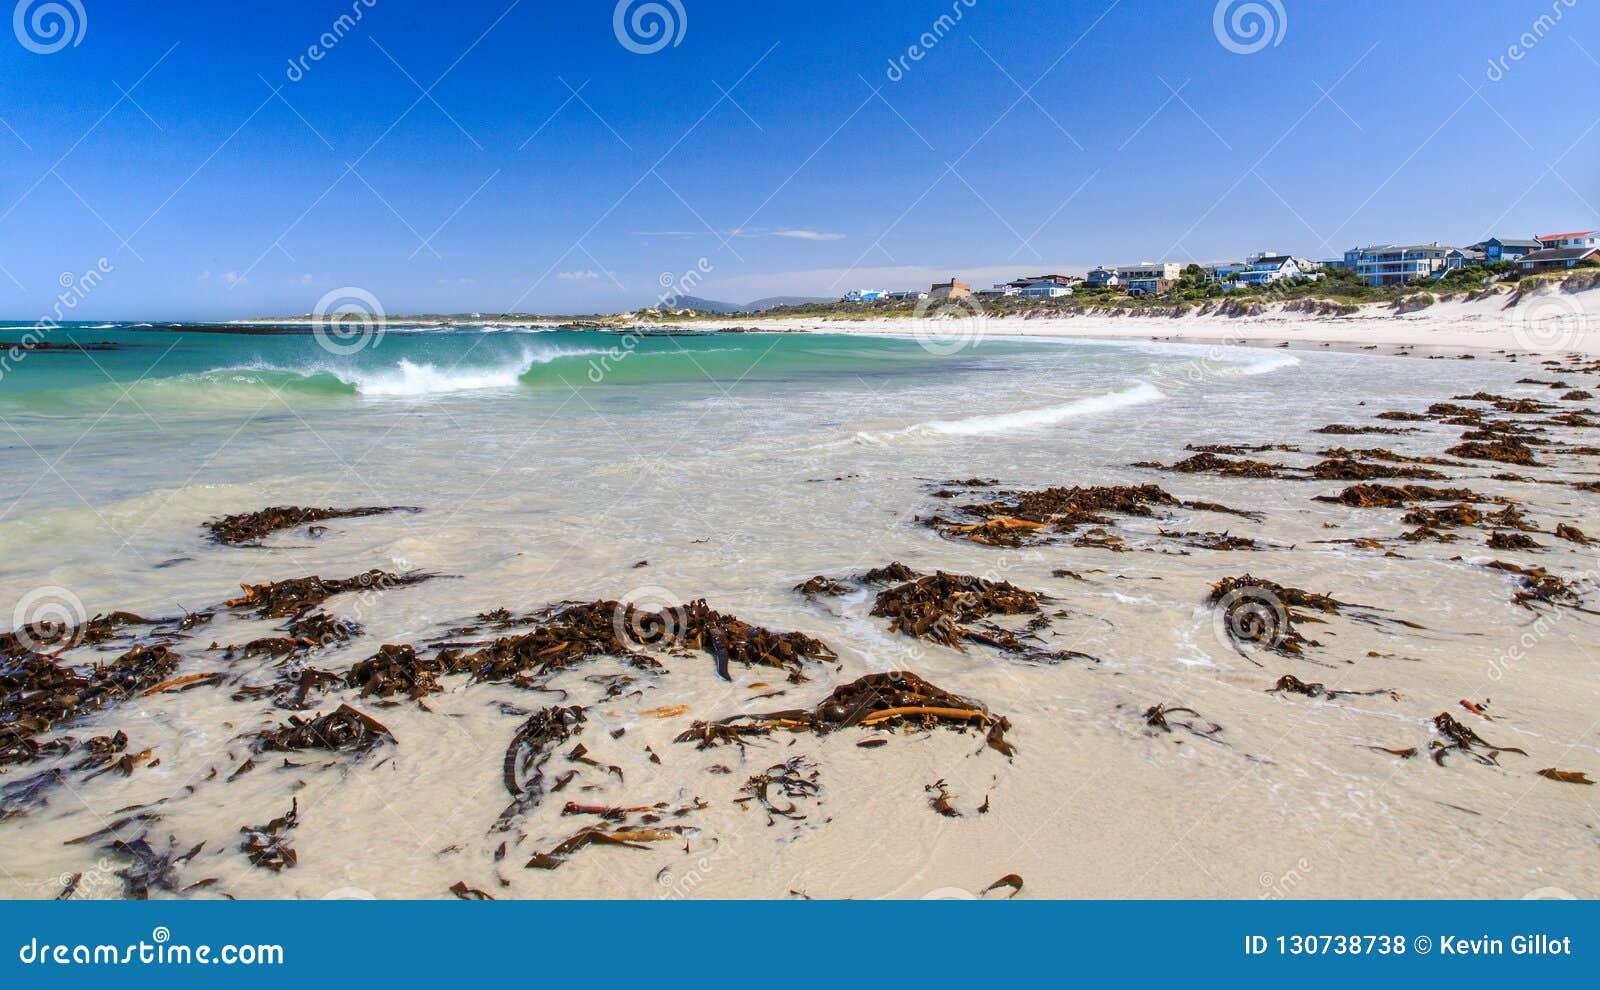 Kelp on the beach - Pearly beach - South Africa